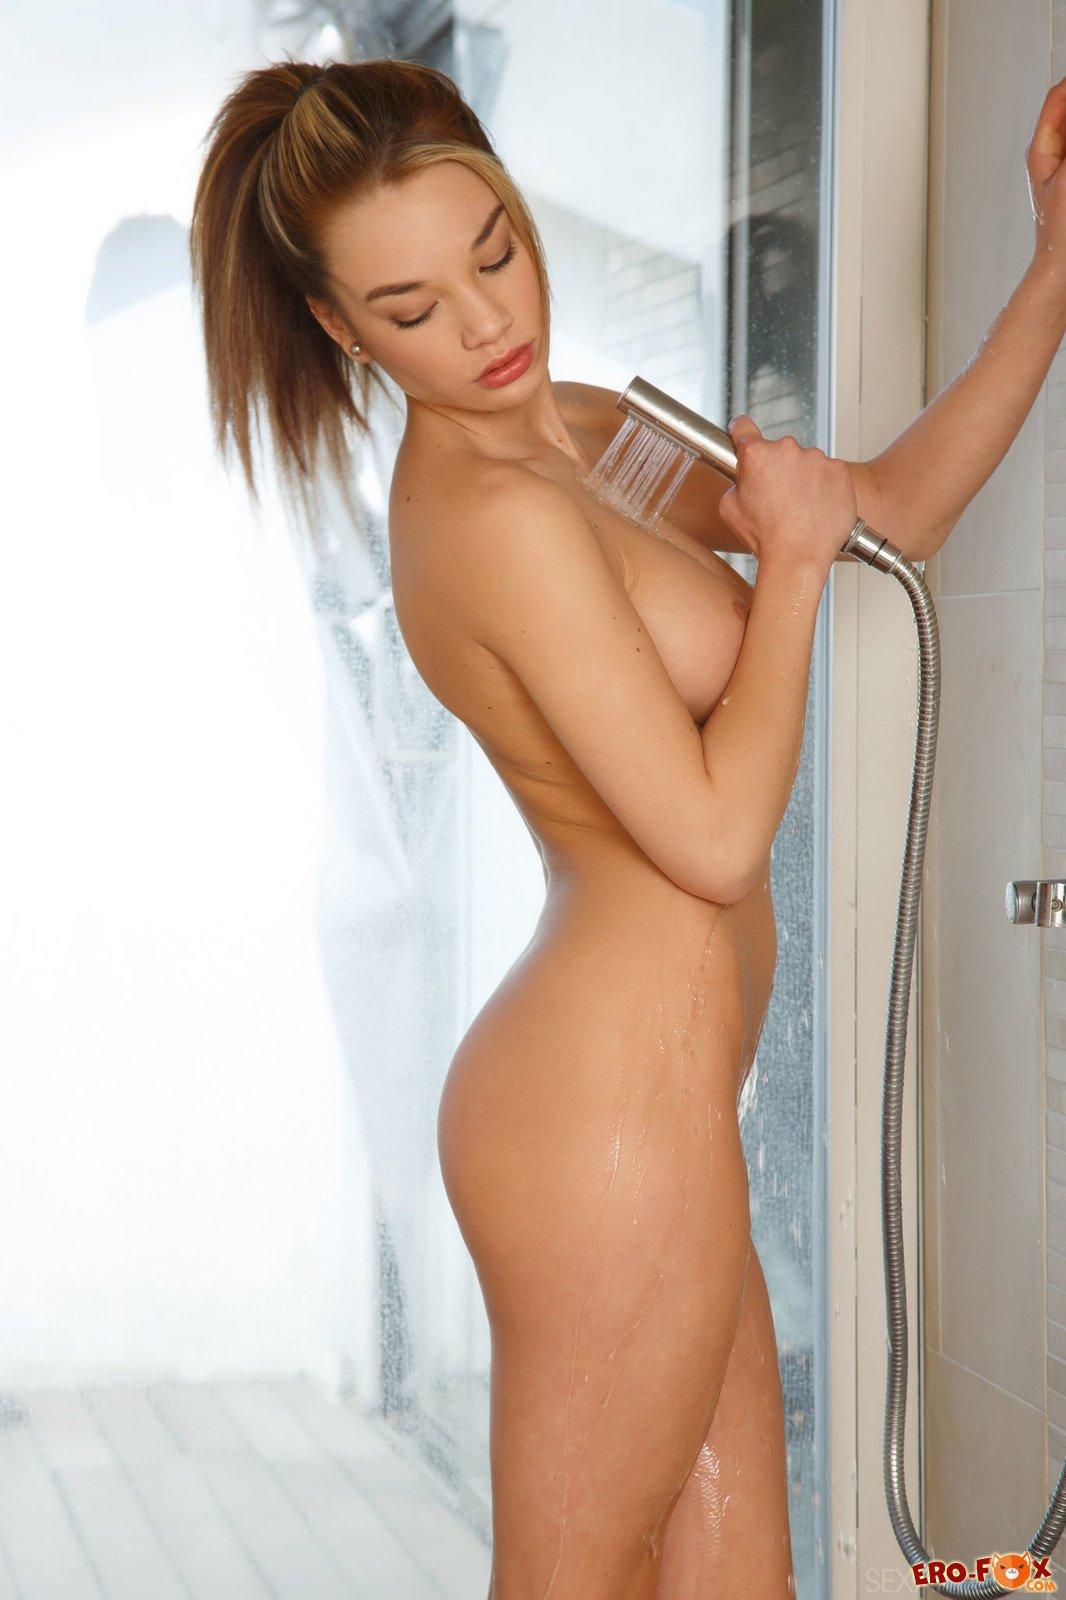 Грудастая голая девушка под душем